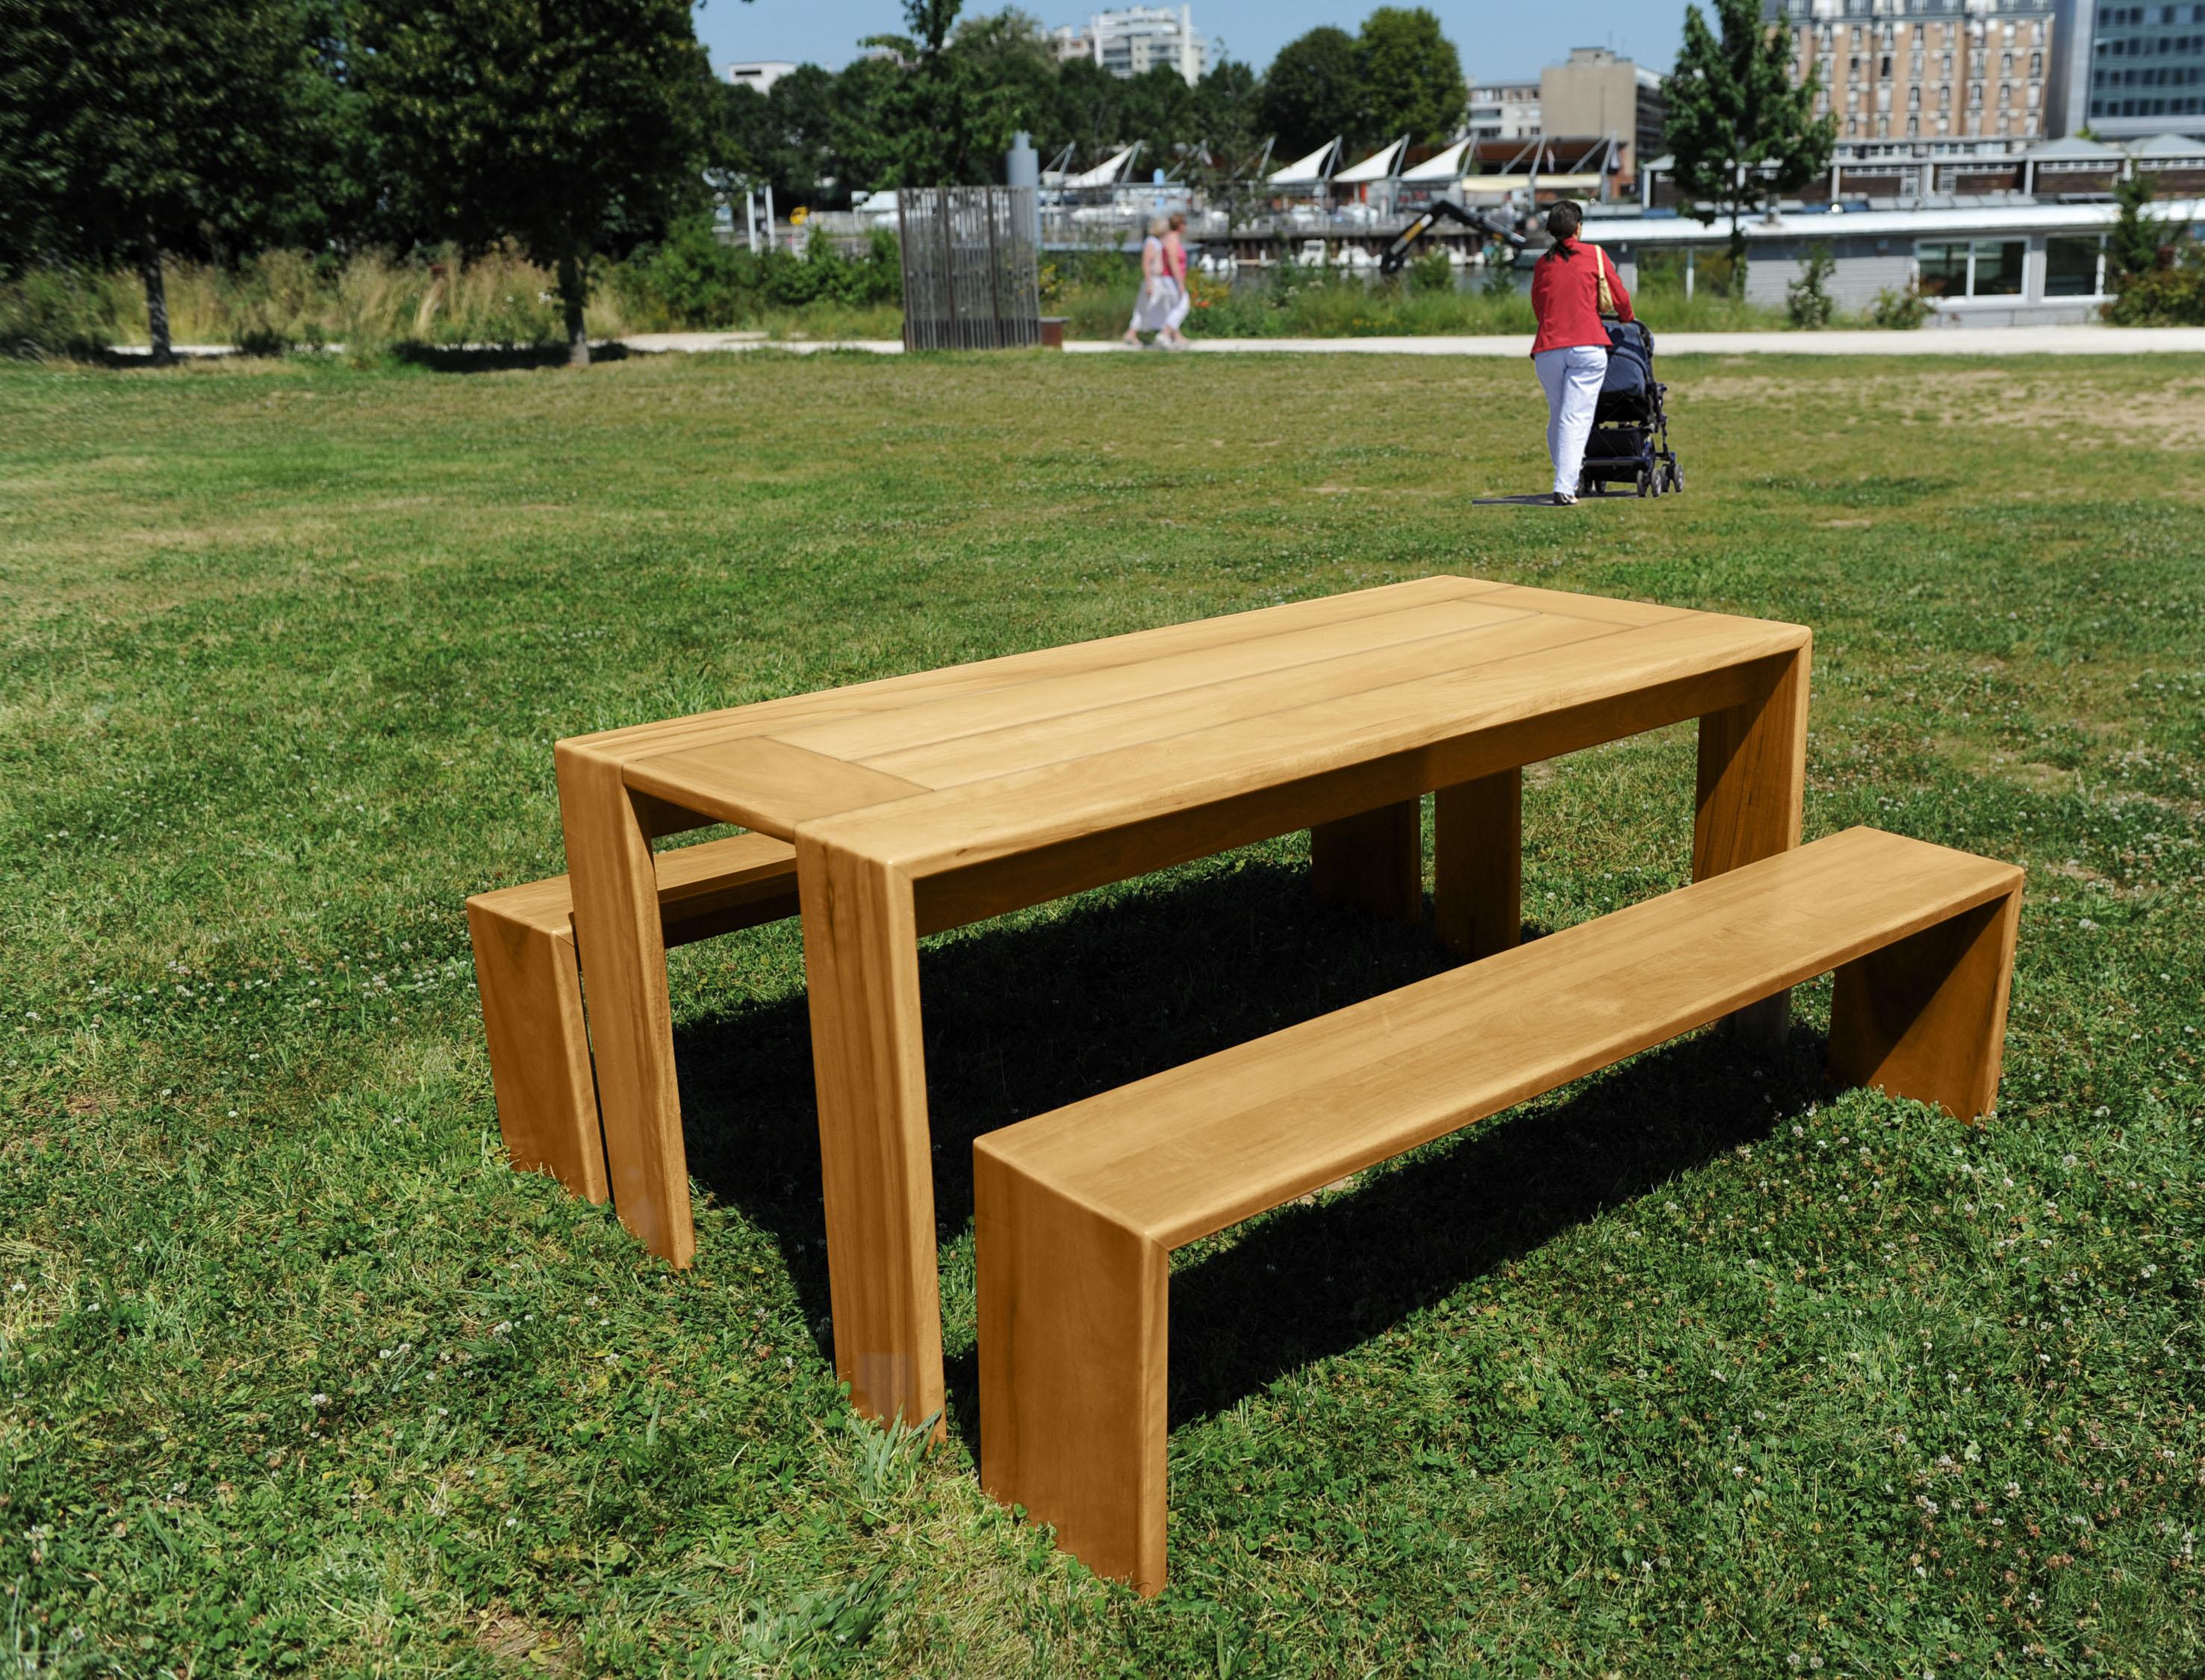 bank tisch kombination como parkb nke stadtmobiliar kommunalbedarf at. Black Bedroom Furniture Sets. Home Design Ideas